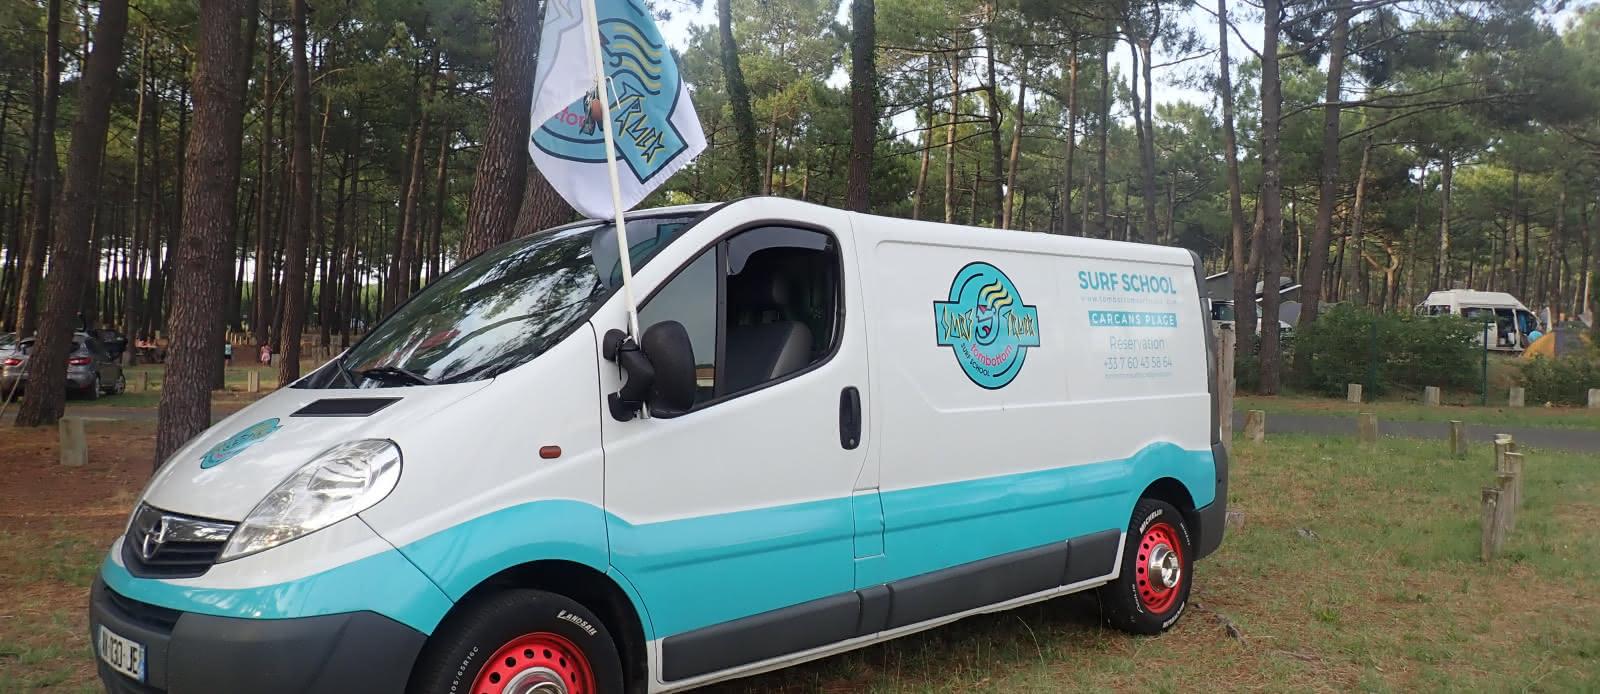 Tombottom Surf Truck 9